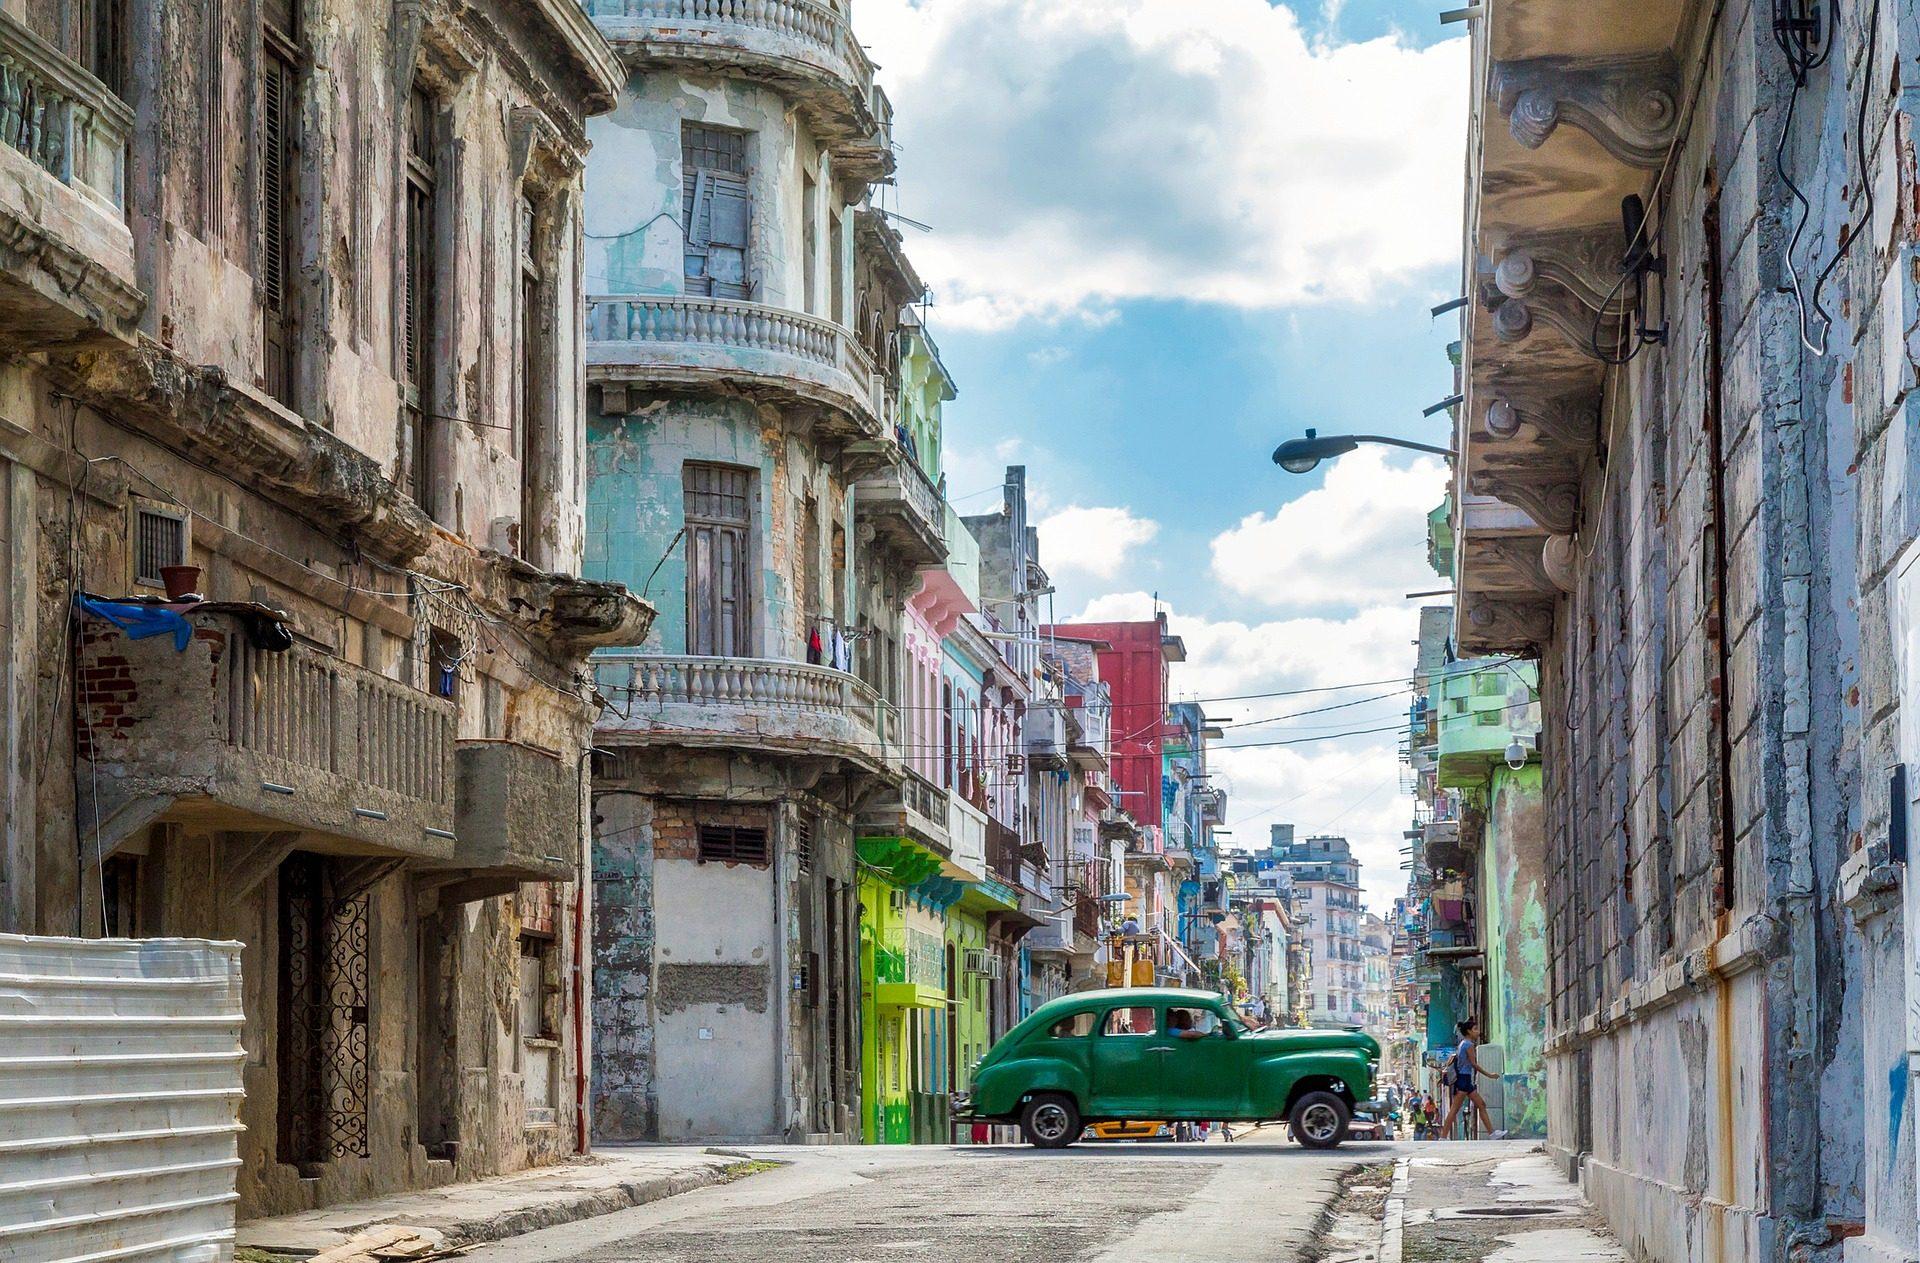 Tips to Follow when you Travel to Cuba